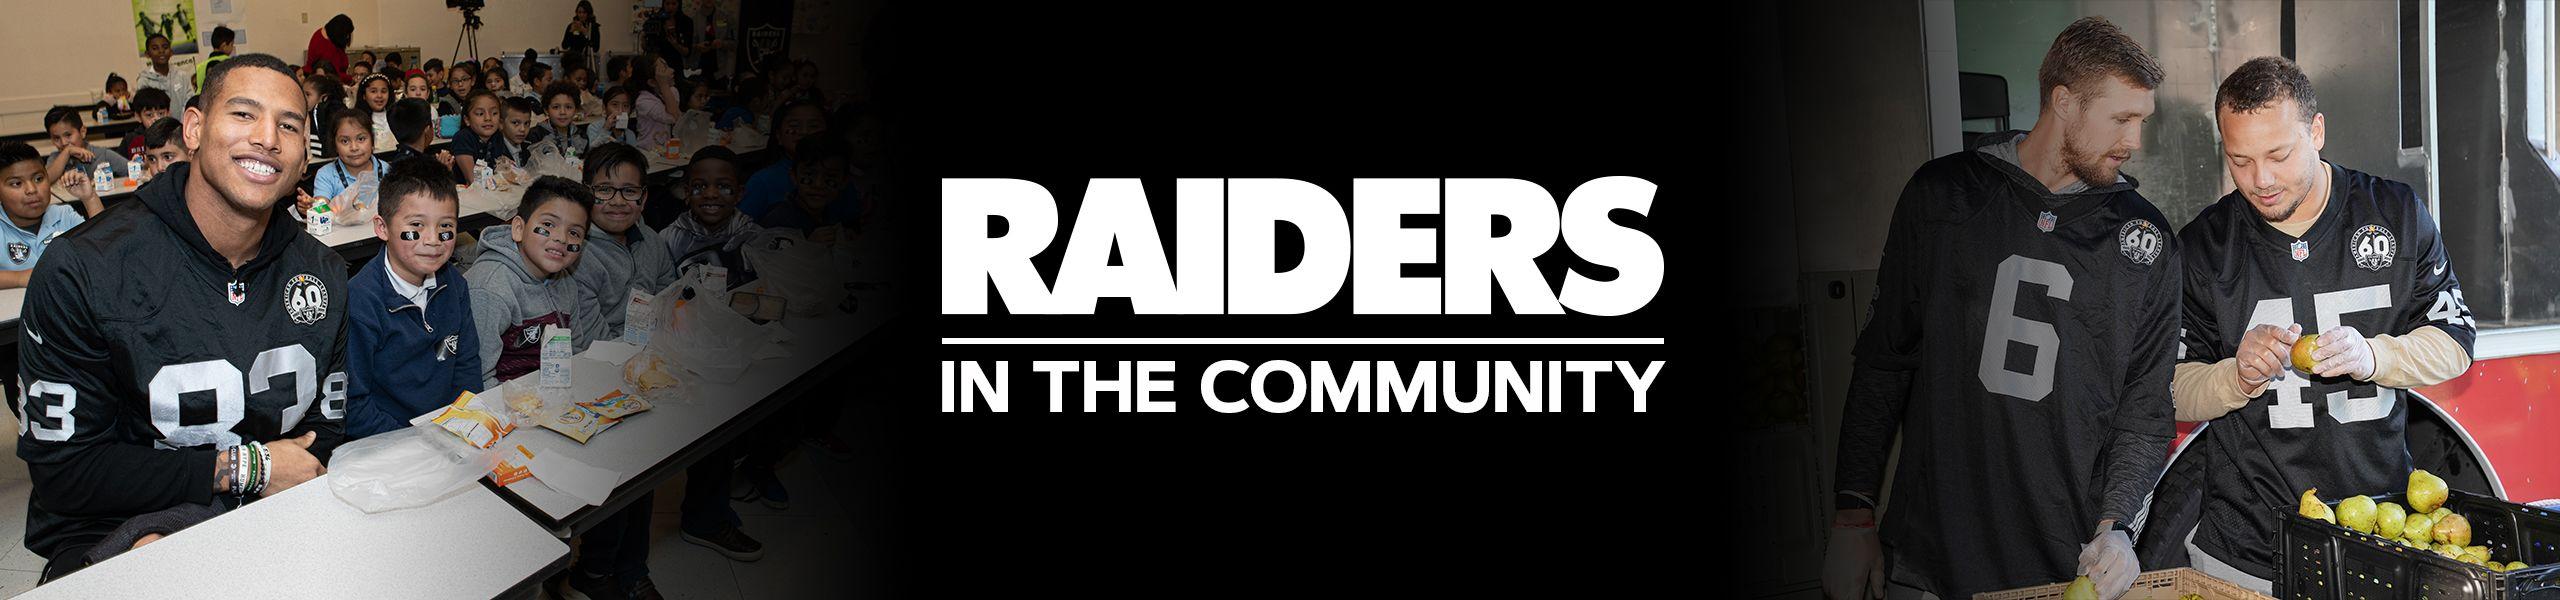 RaidersInCommunityHeader_2560x600